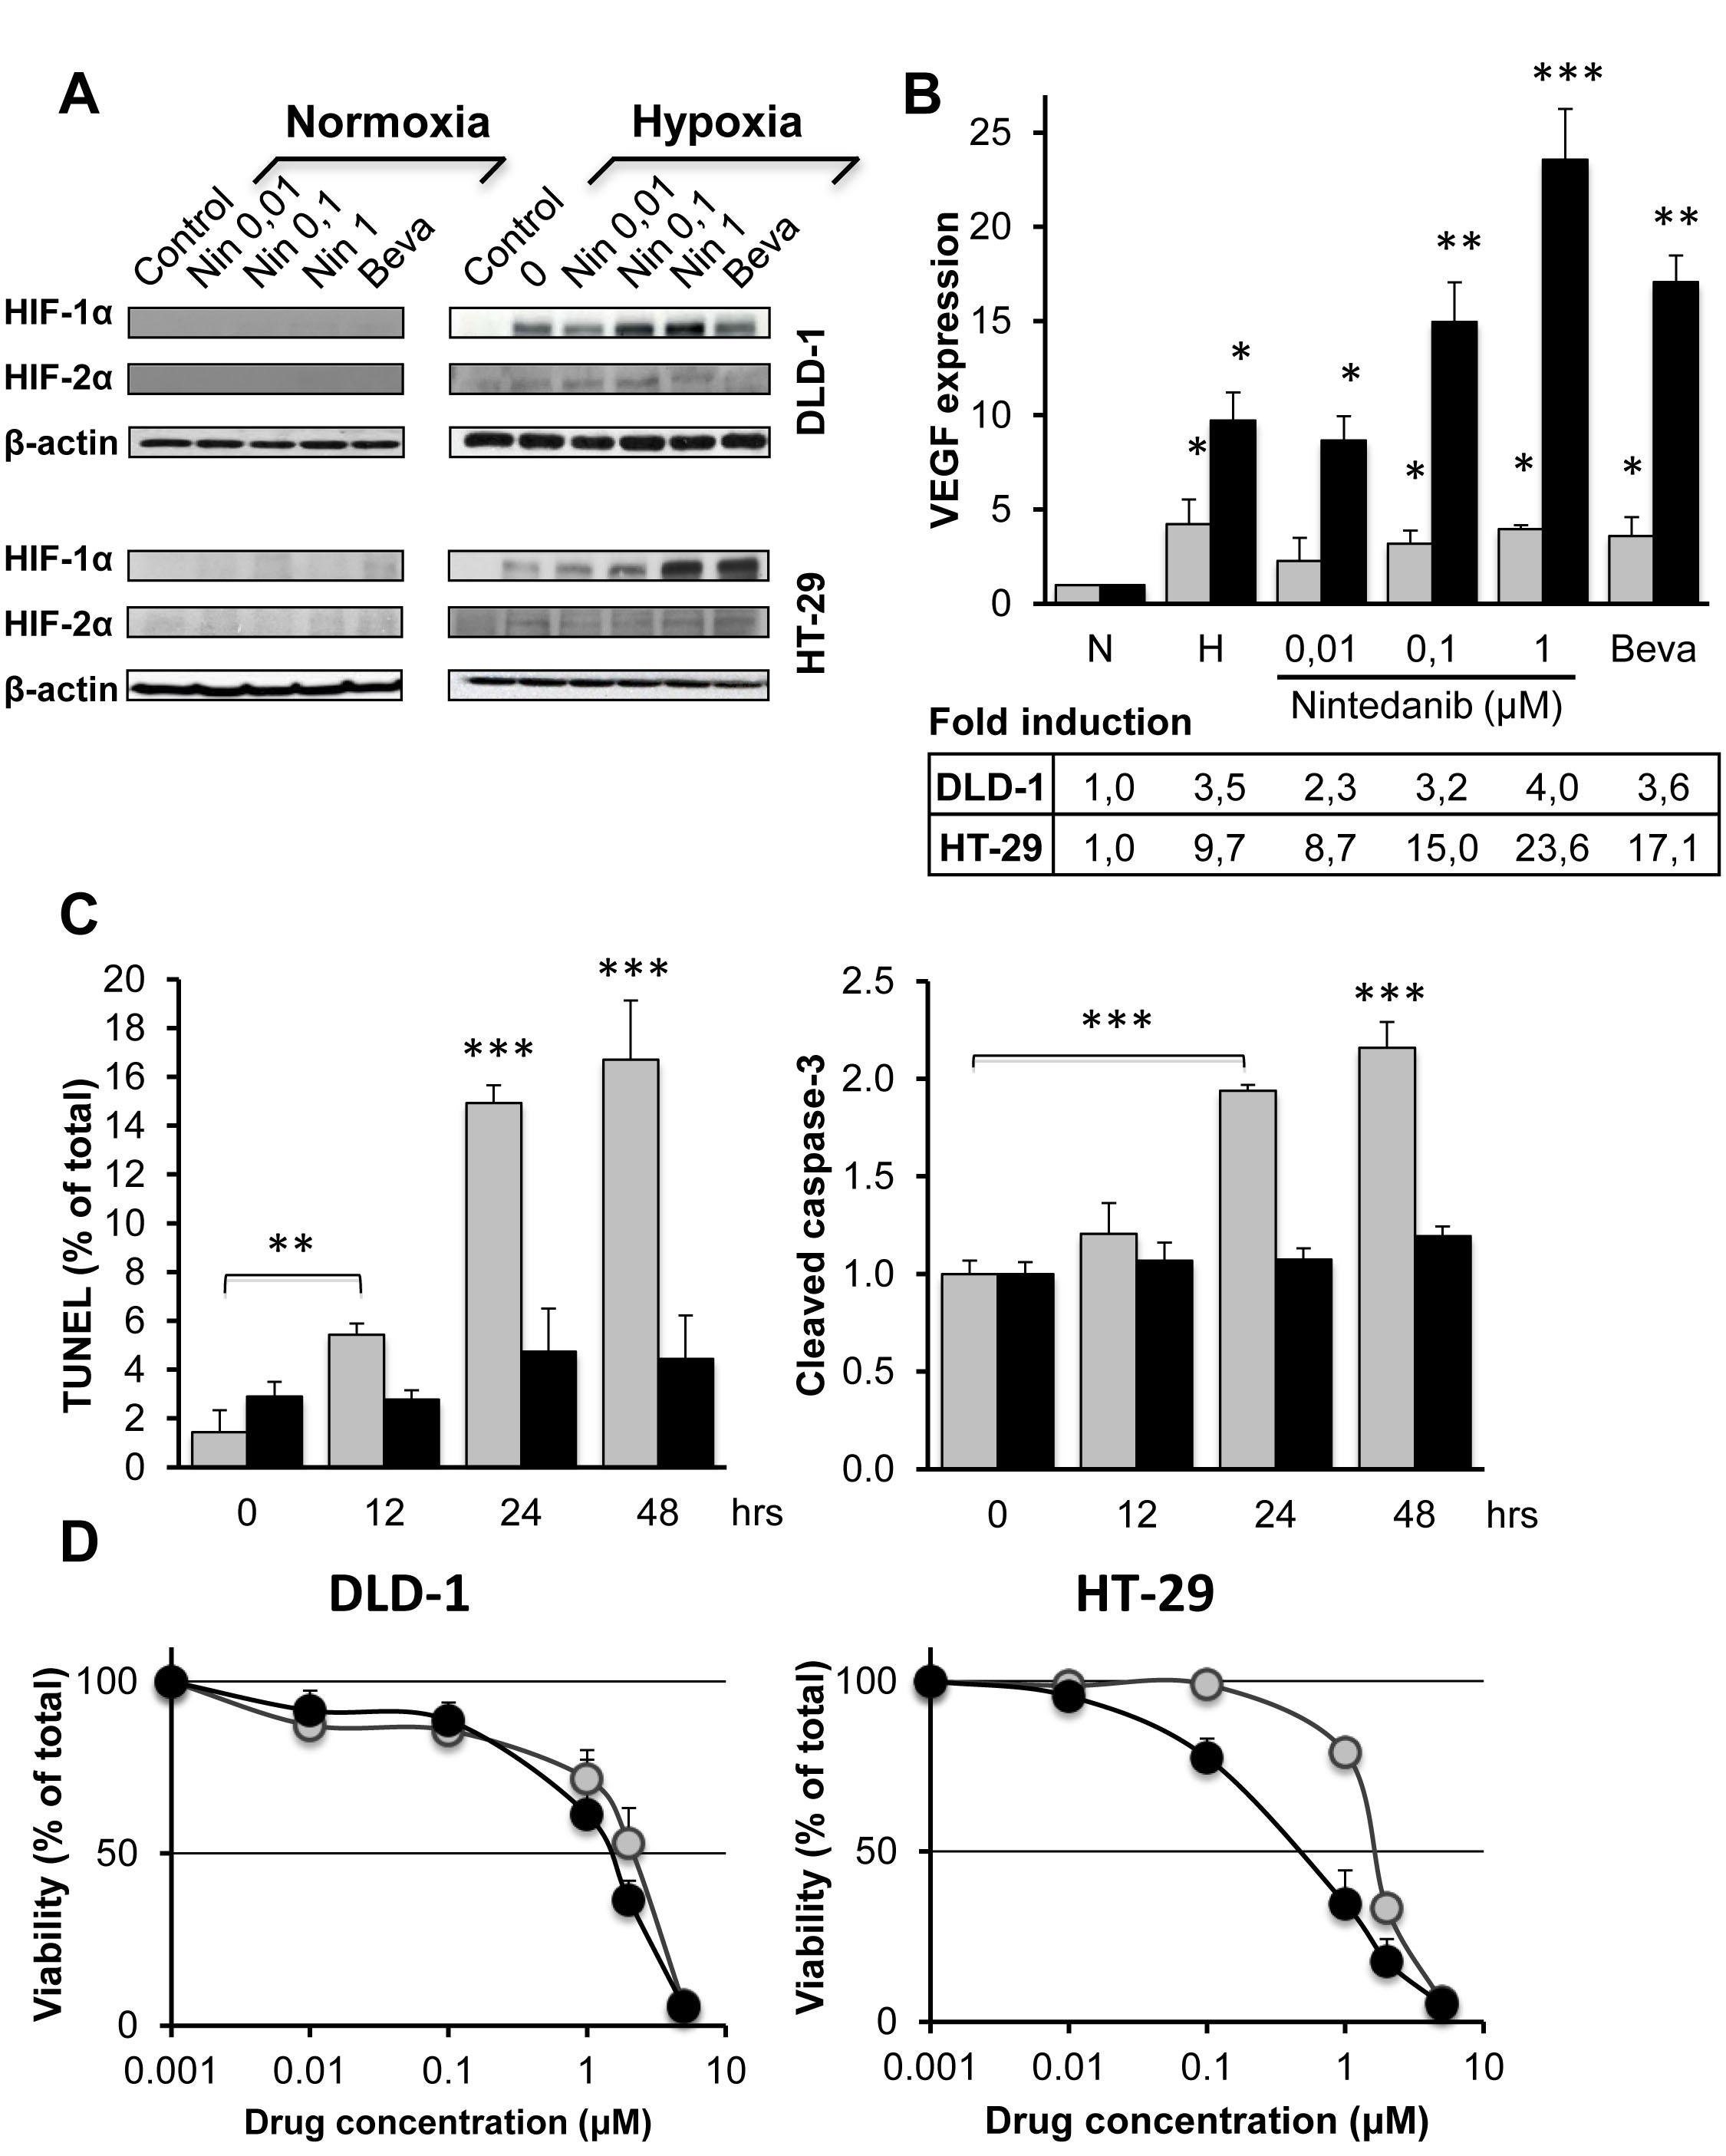 Influence of bevacizumab and nintedanib on CRC cells under normoxia and hypoxia.